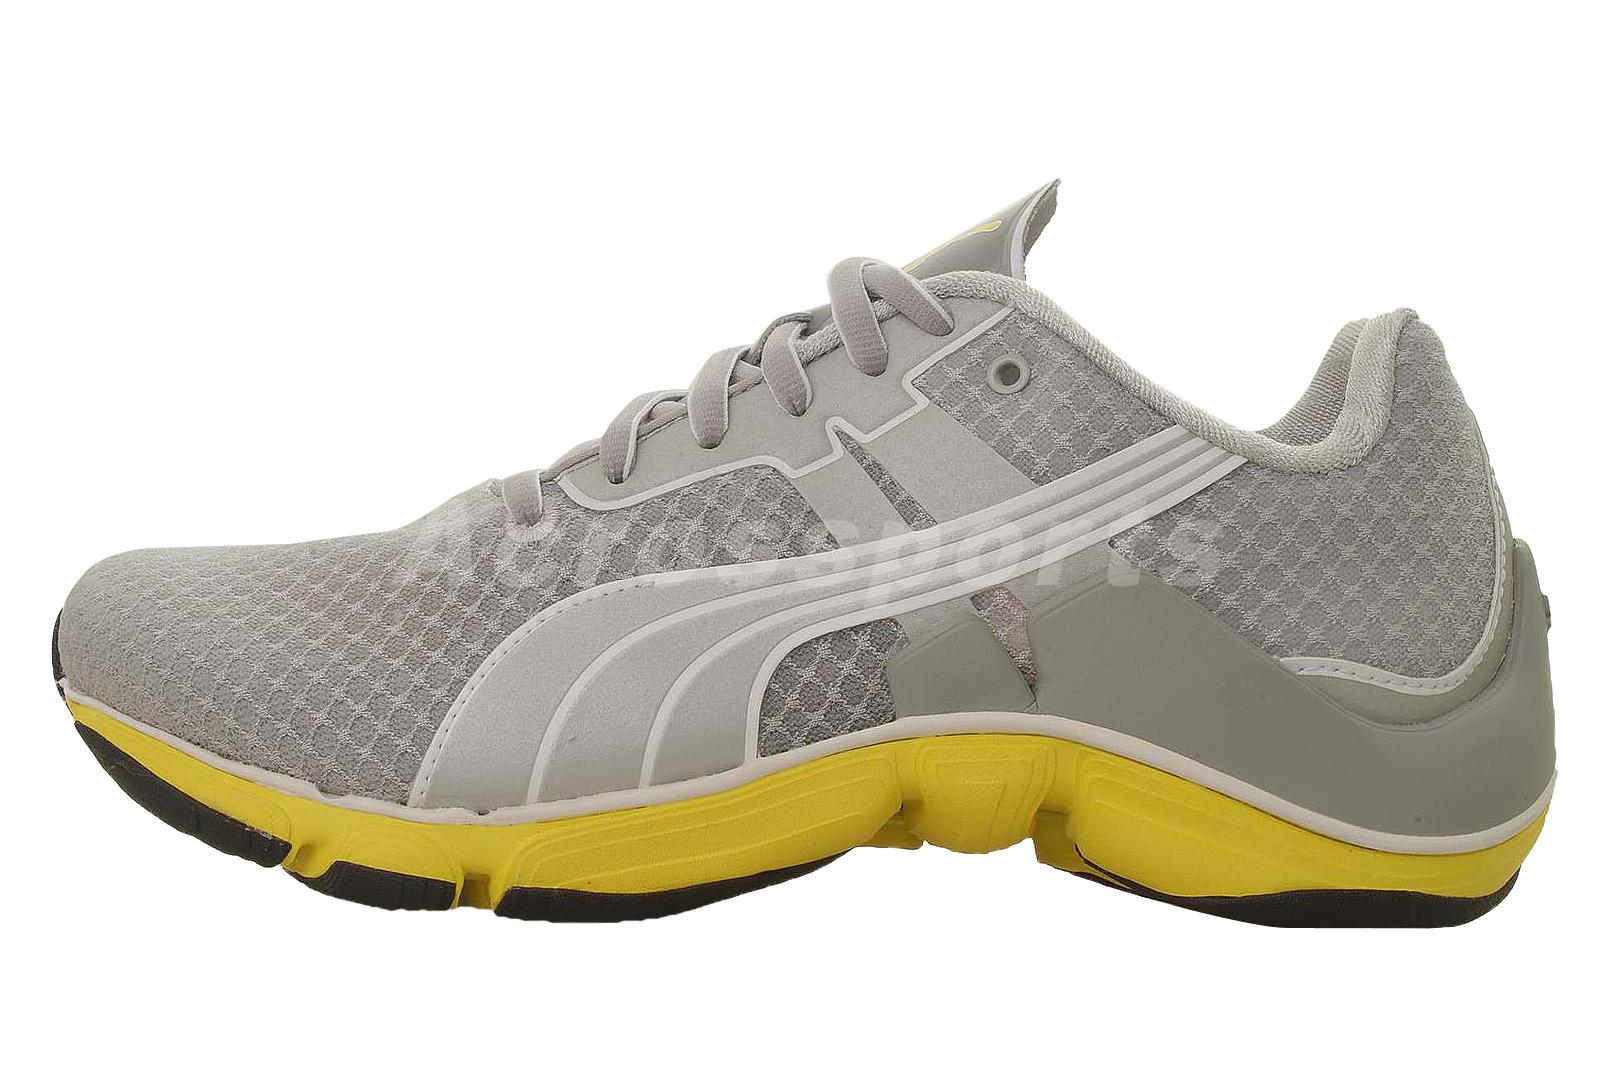 puma mobium elite wns womens running shoes 2013 new